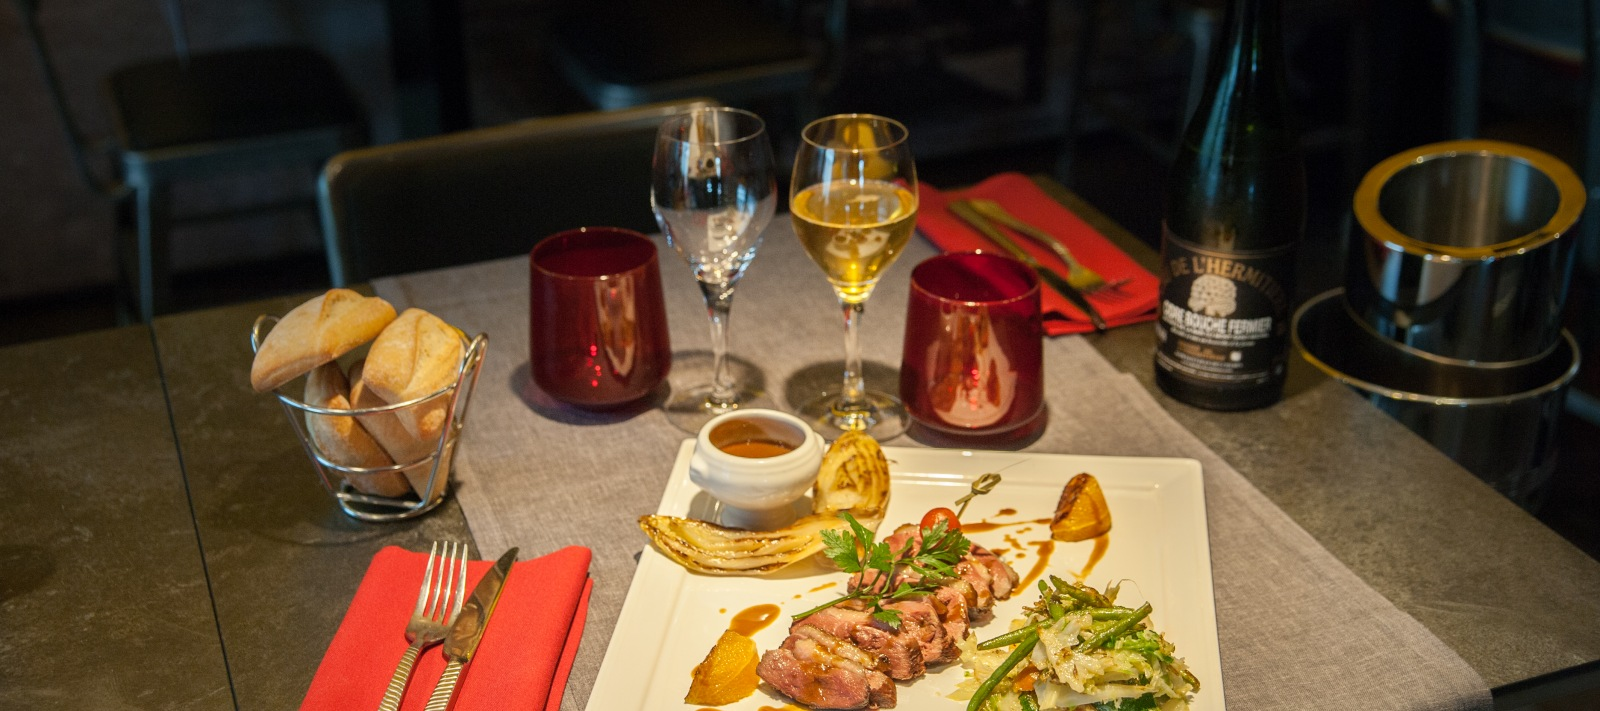 The Restaurant l'Atelier